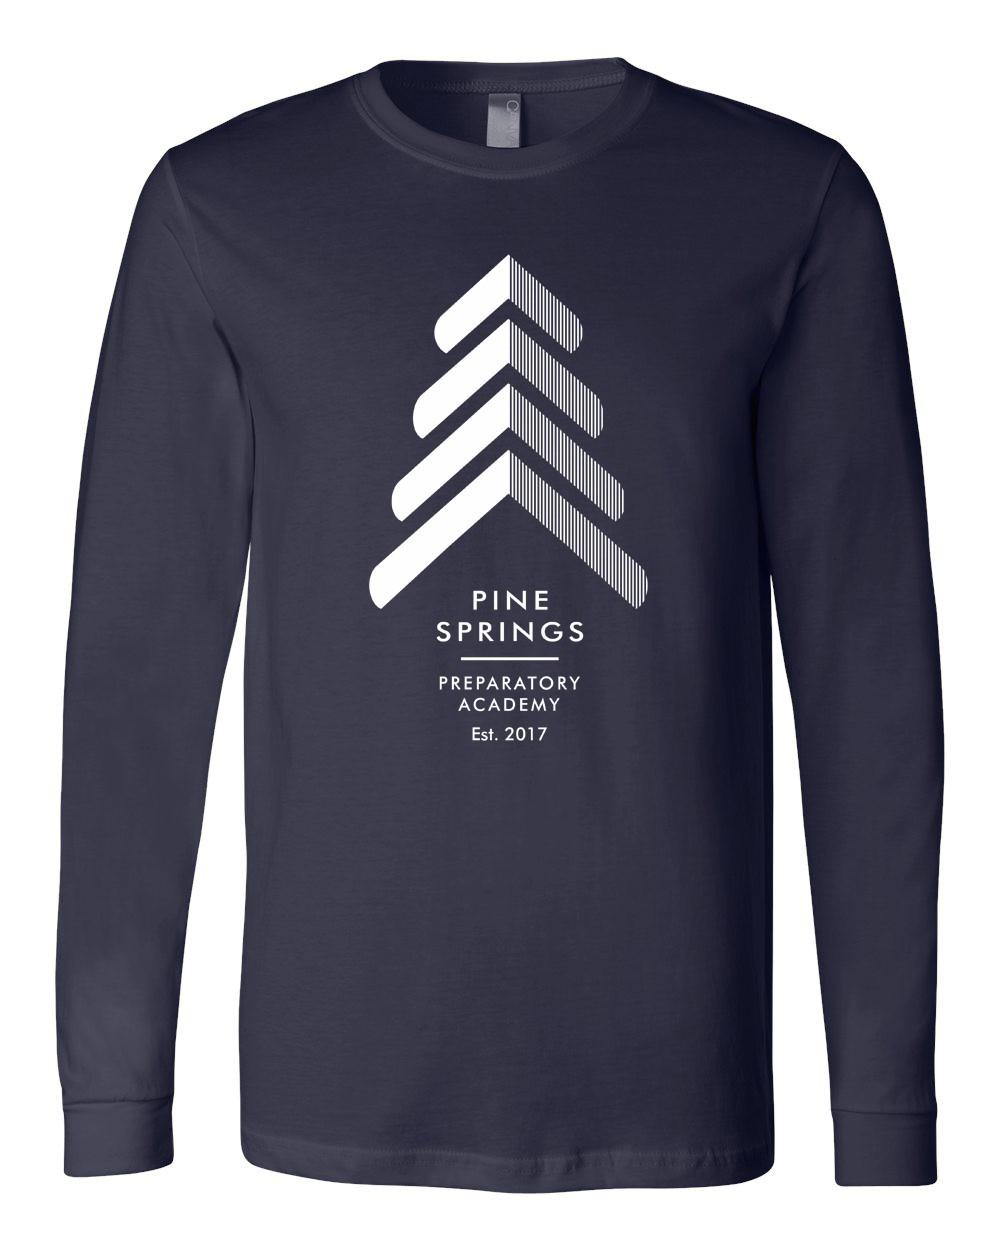 Pine Springs Adult Soft Spun Cotton Long Sleeve Tees